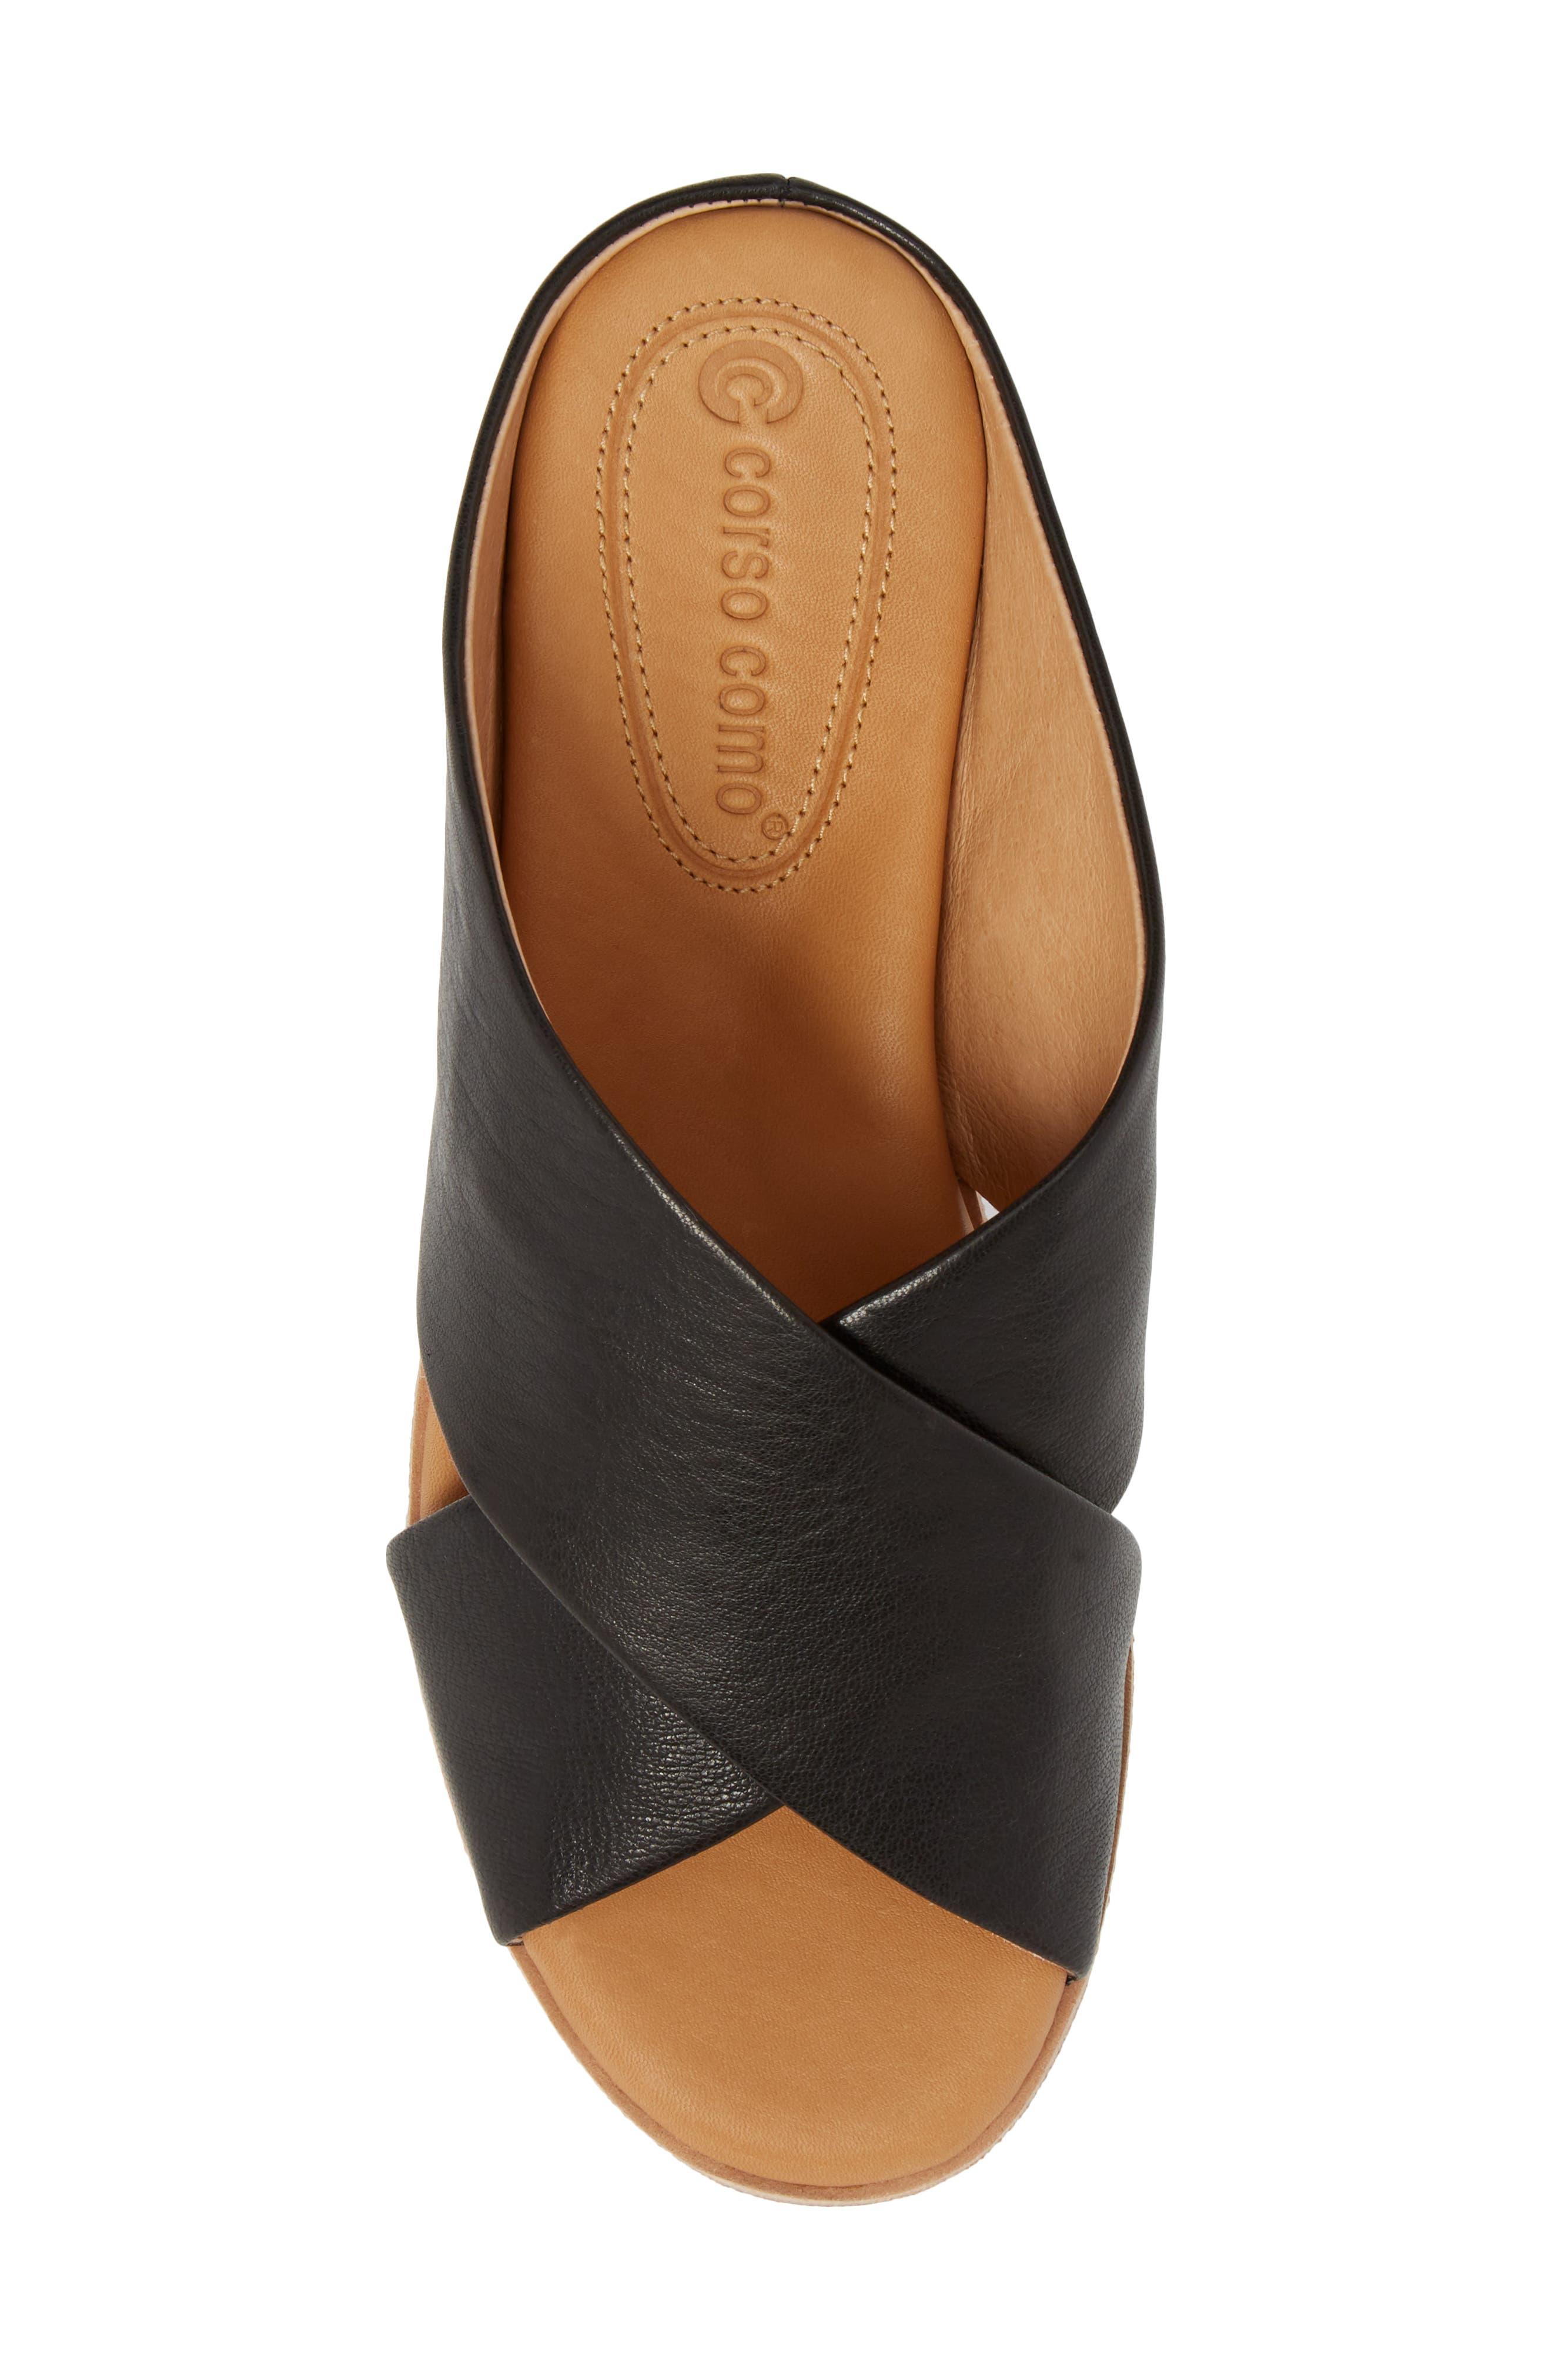 Brunna Sandal,                             Alternate thumbnail 5, color,                             Black Leather